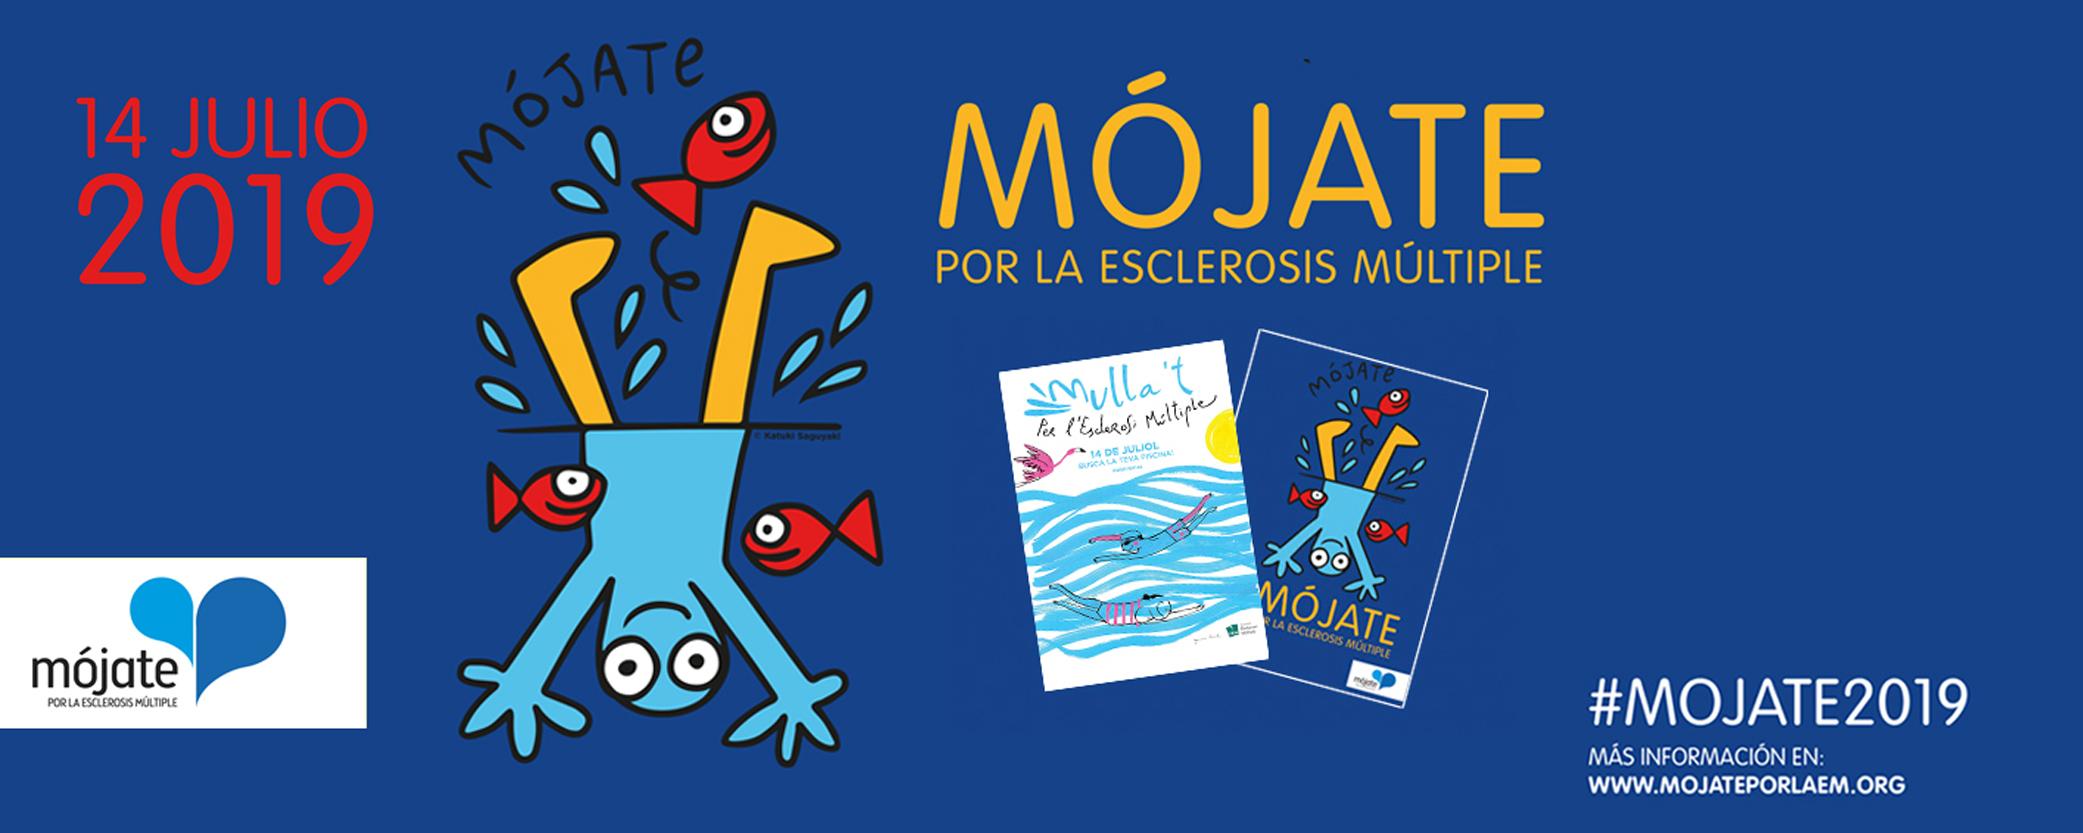 slide-mojate-2019